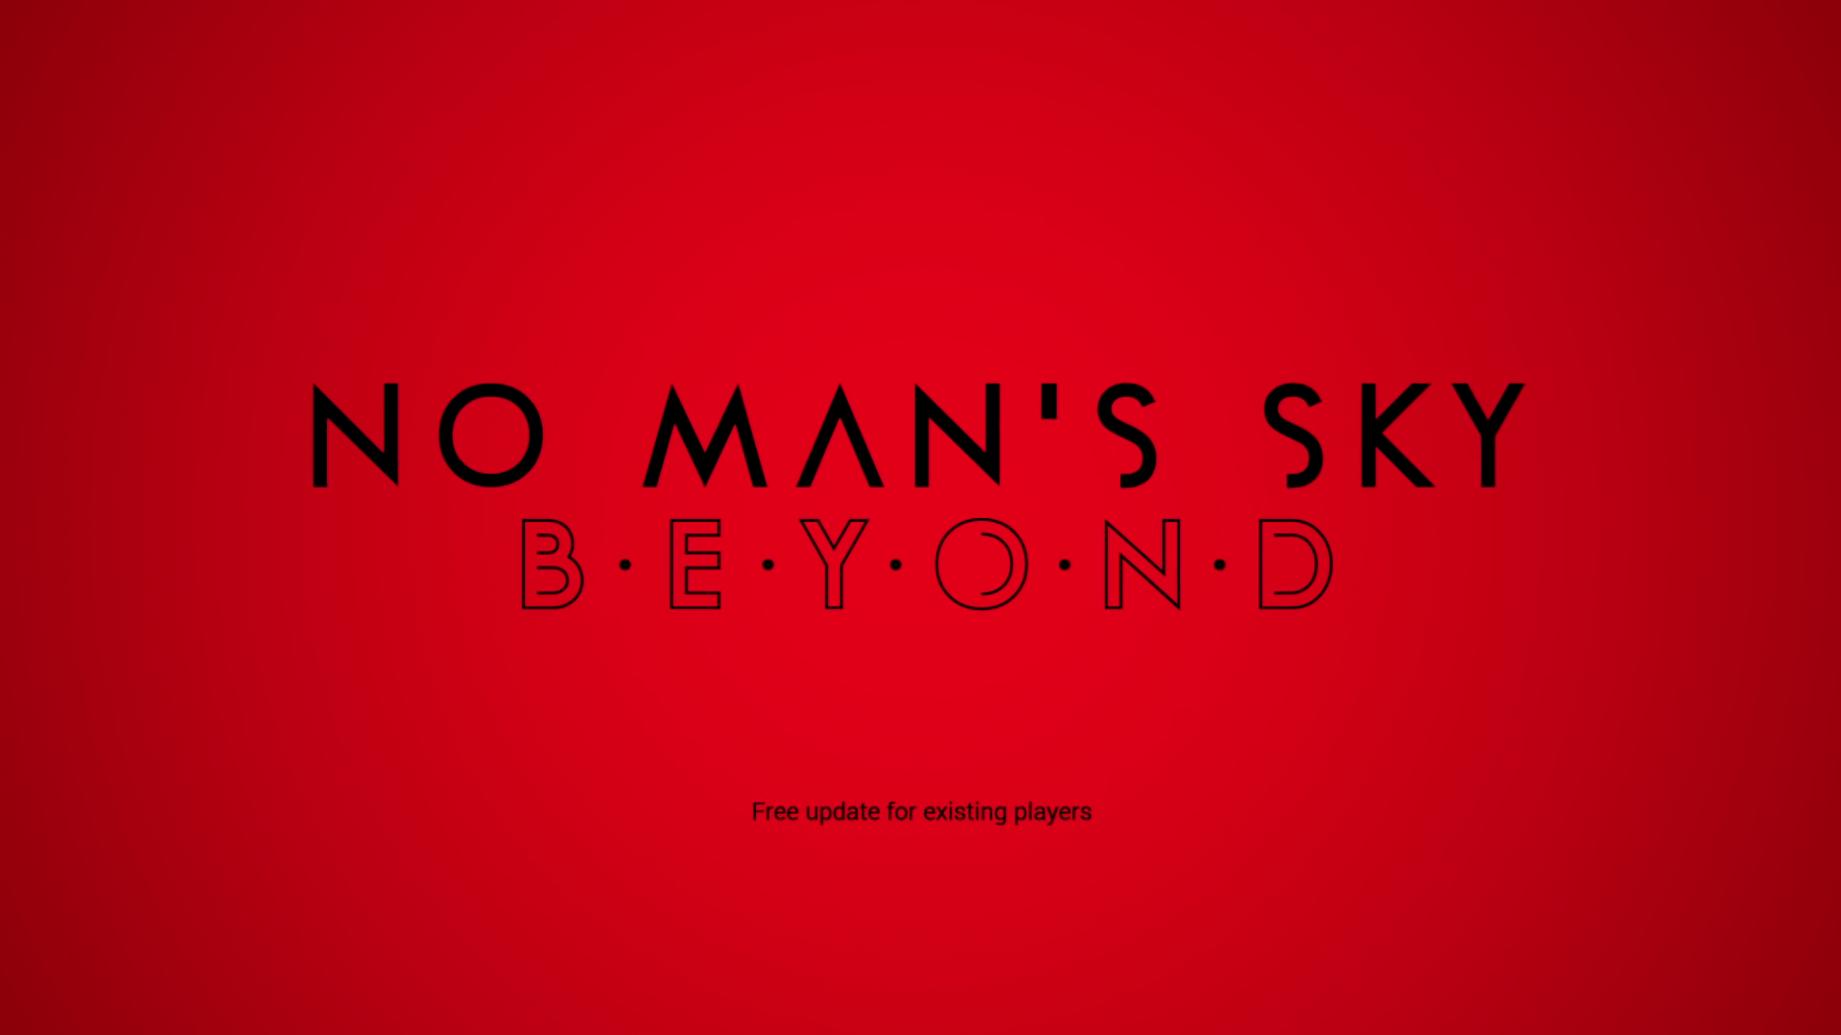 The latest No Man's SKy update will imrpove multiplayer